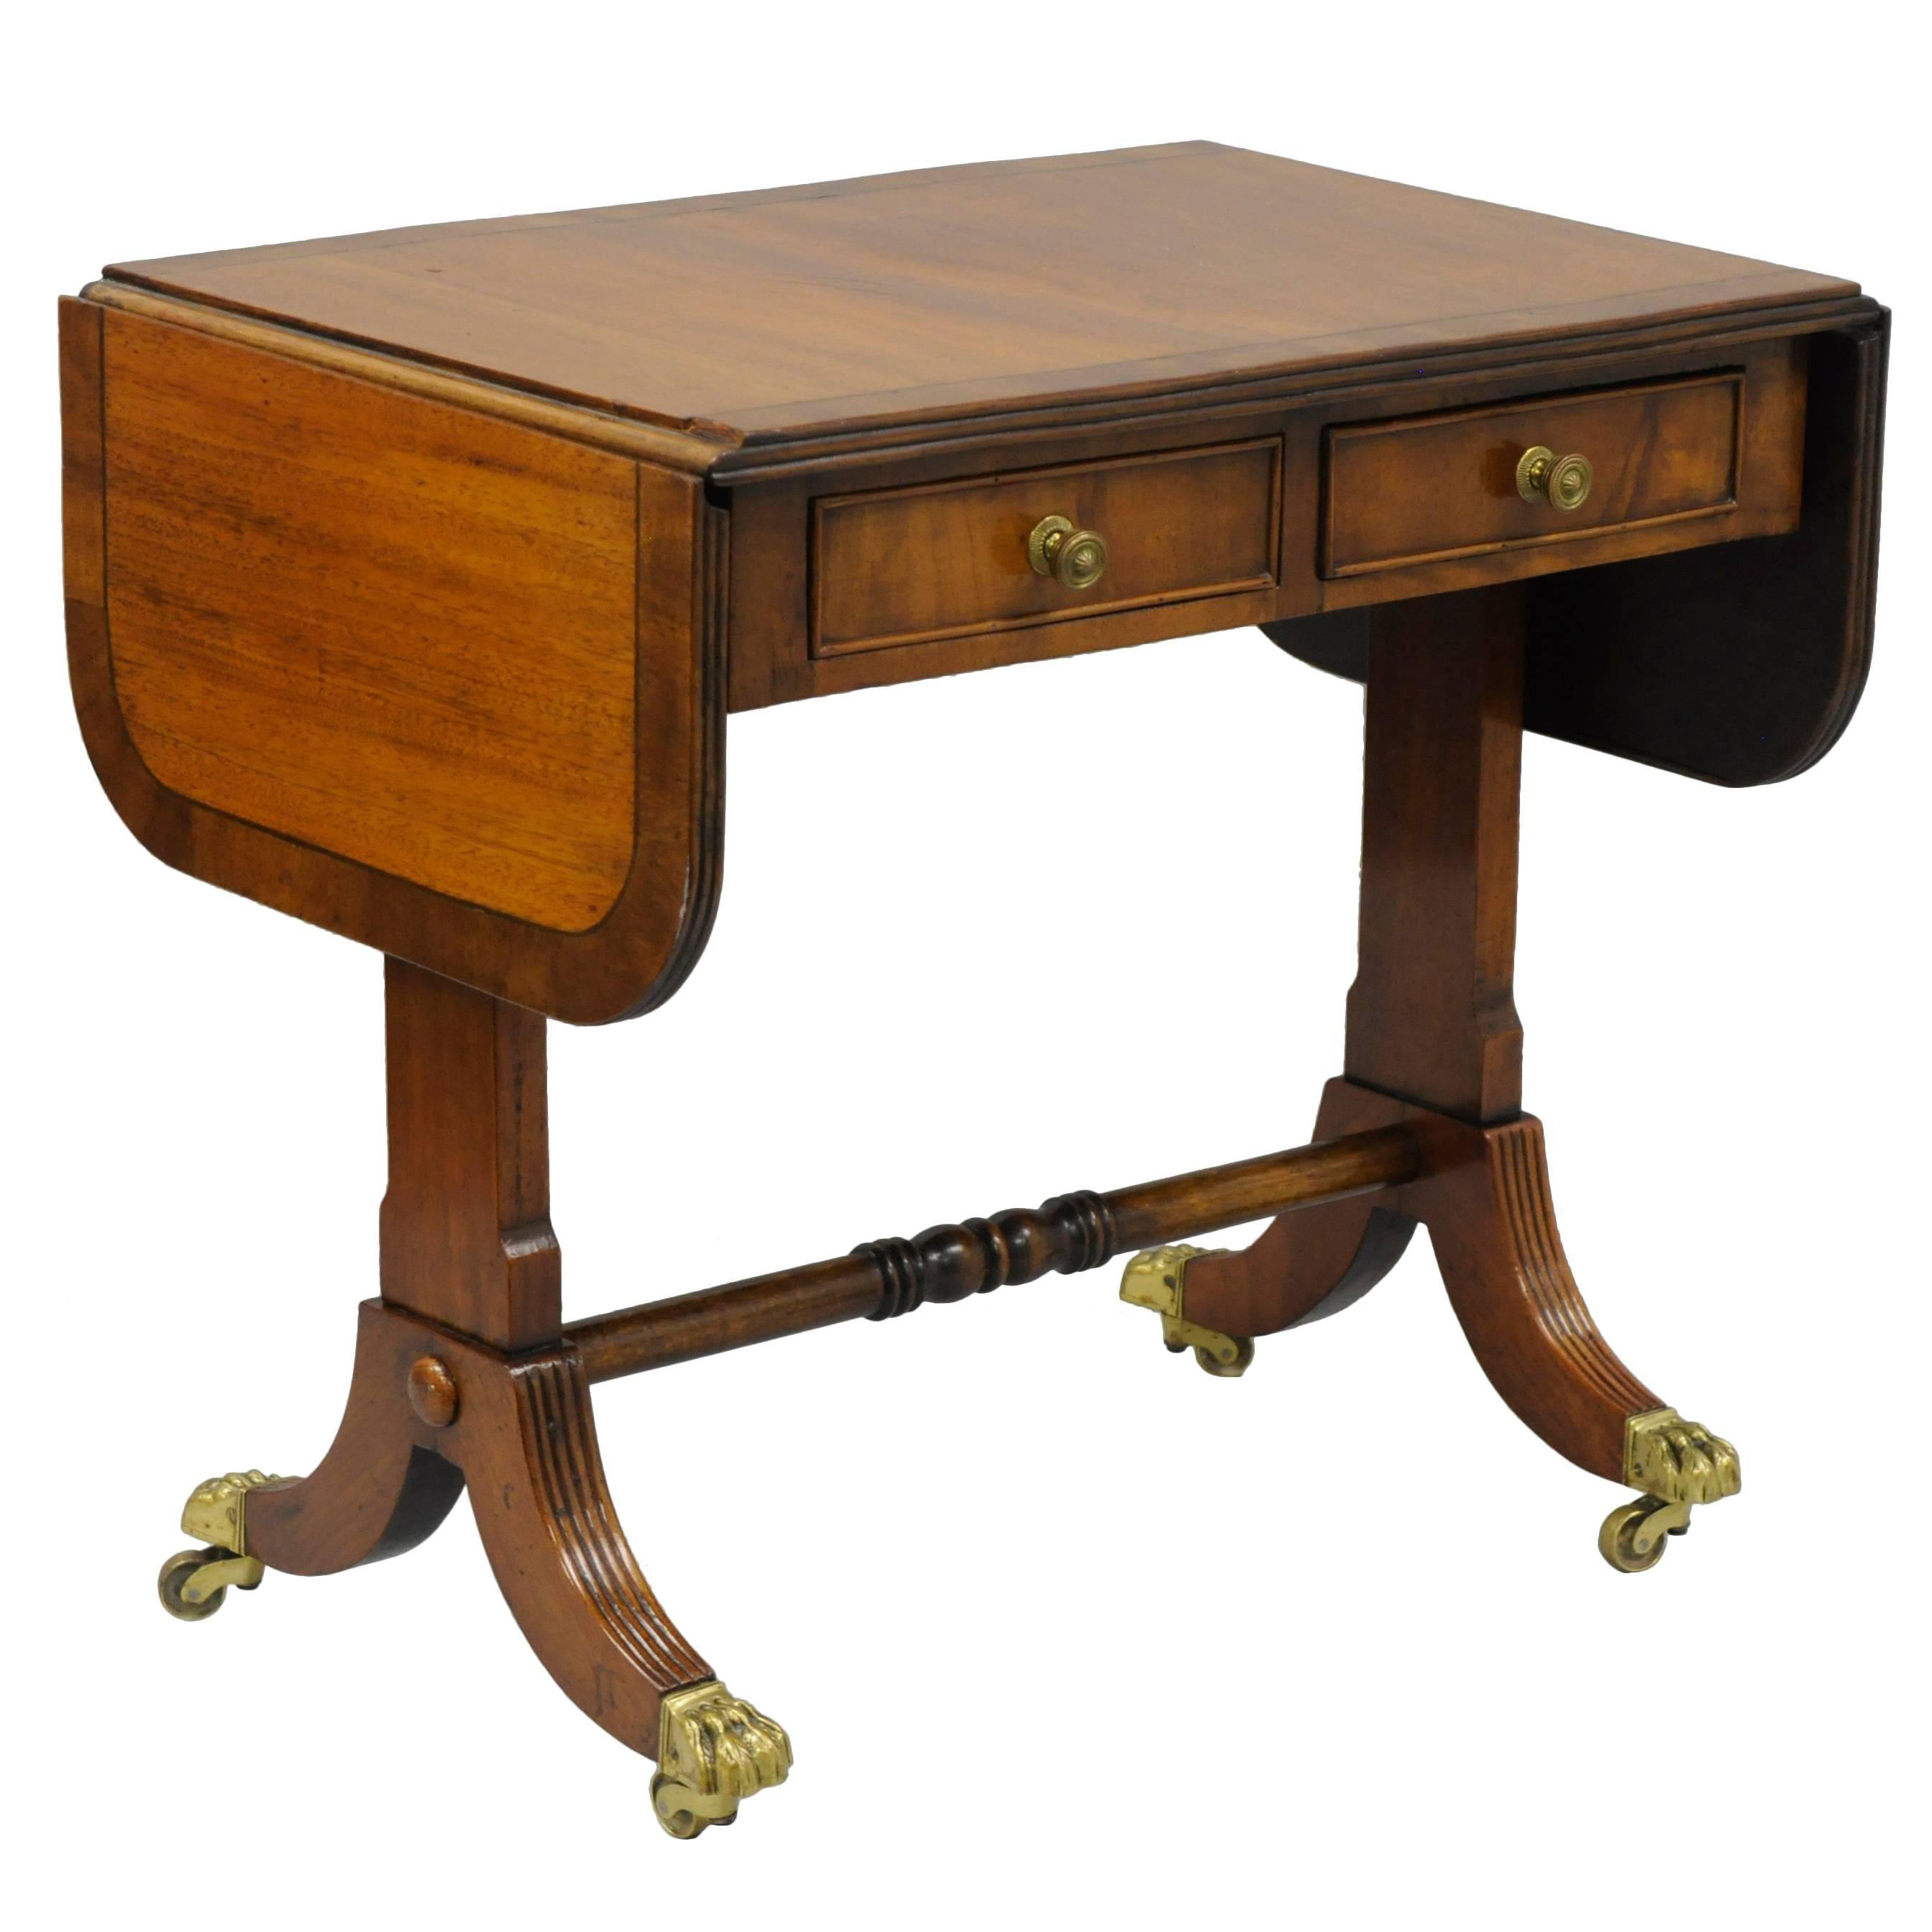 Small Handmade English Regency Style Mahogany Drop Leaf Sofa Hall Coffee  Table 1